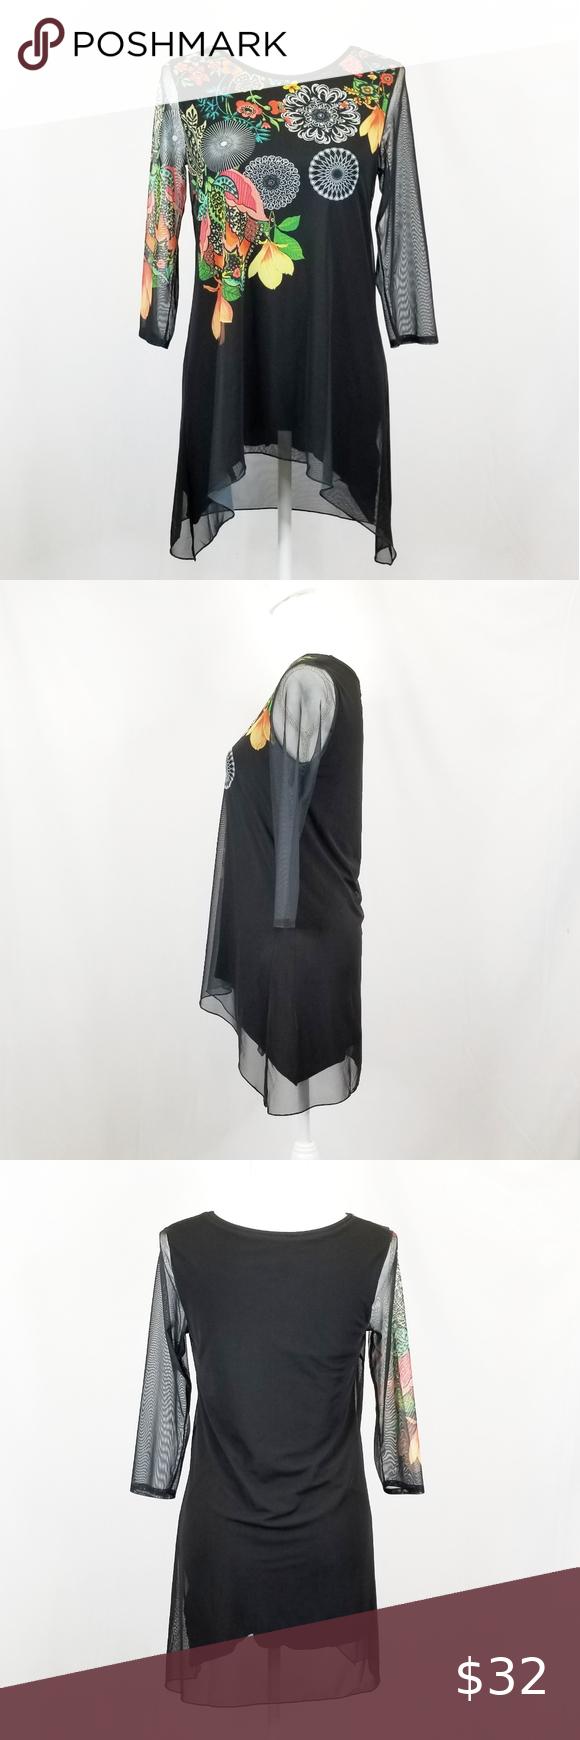 Desigual Black Tunic with Sheer Overlay